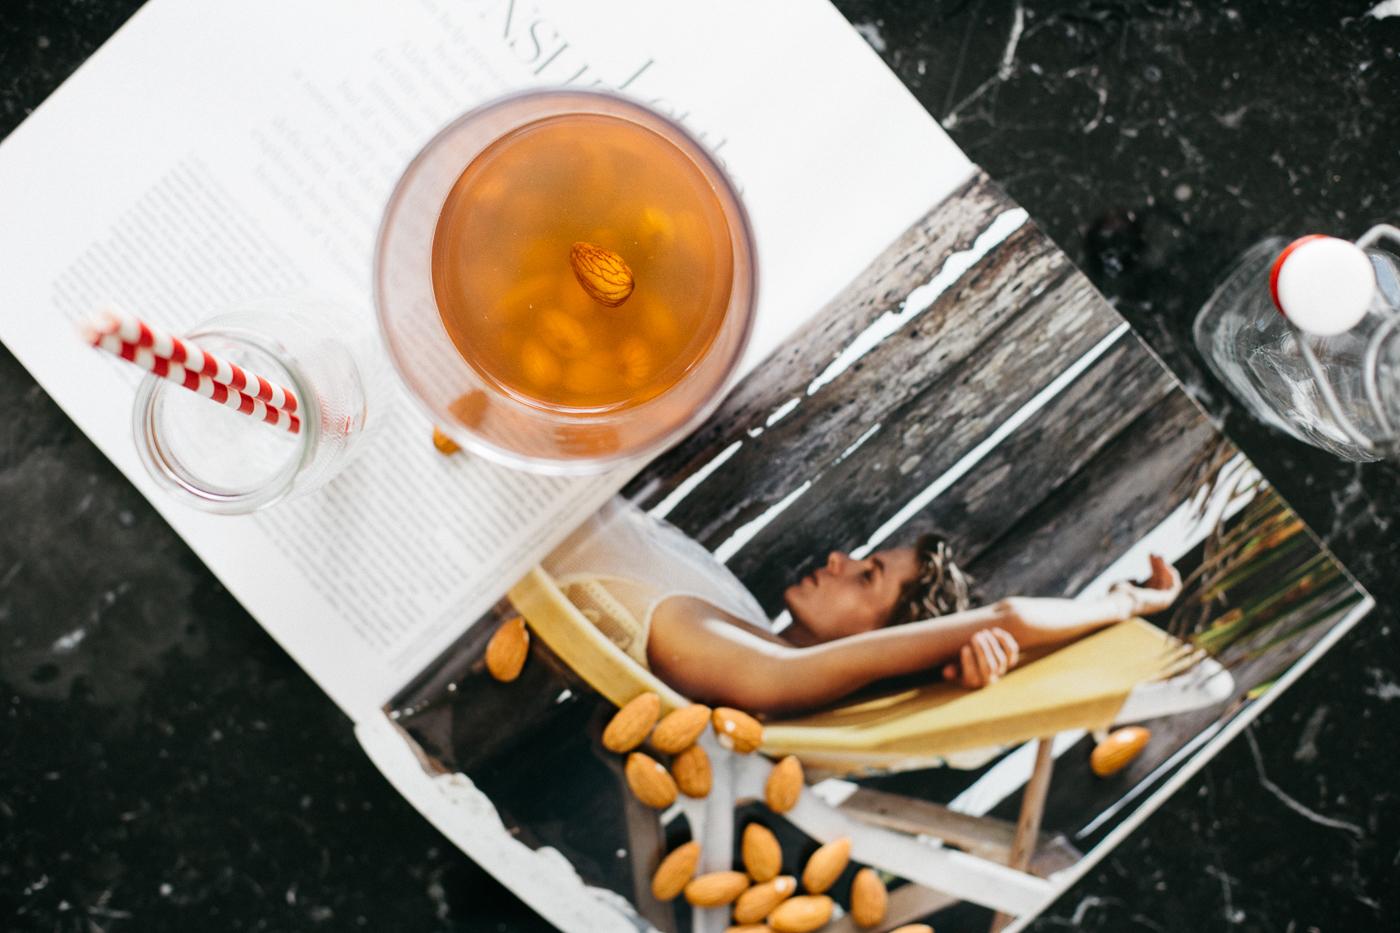 Mandelmilch Rezept: Mandelmilch selber machen | Love Daily Dose